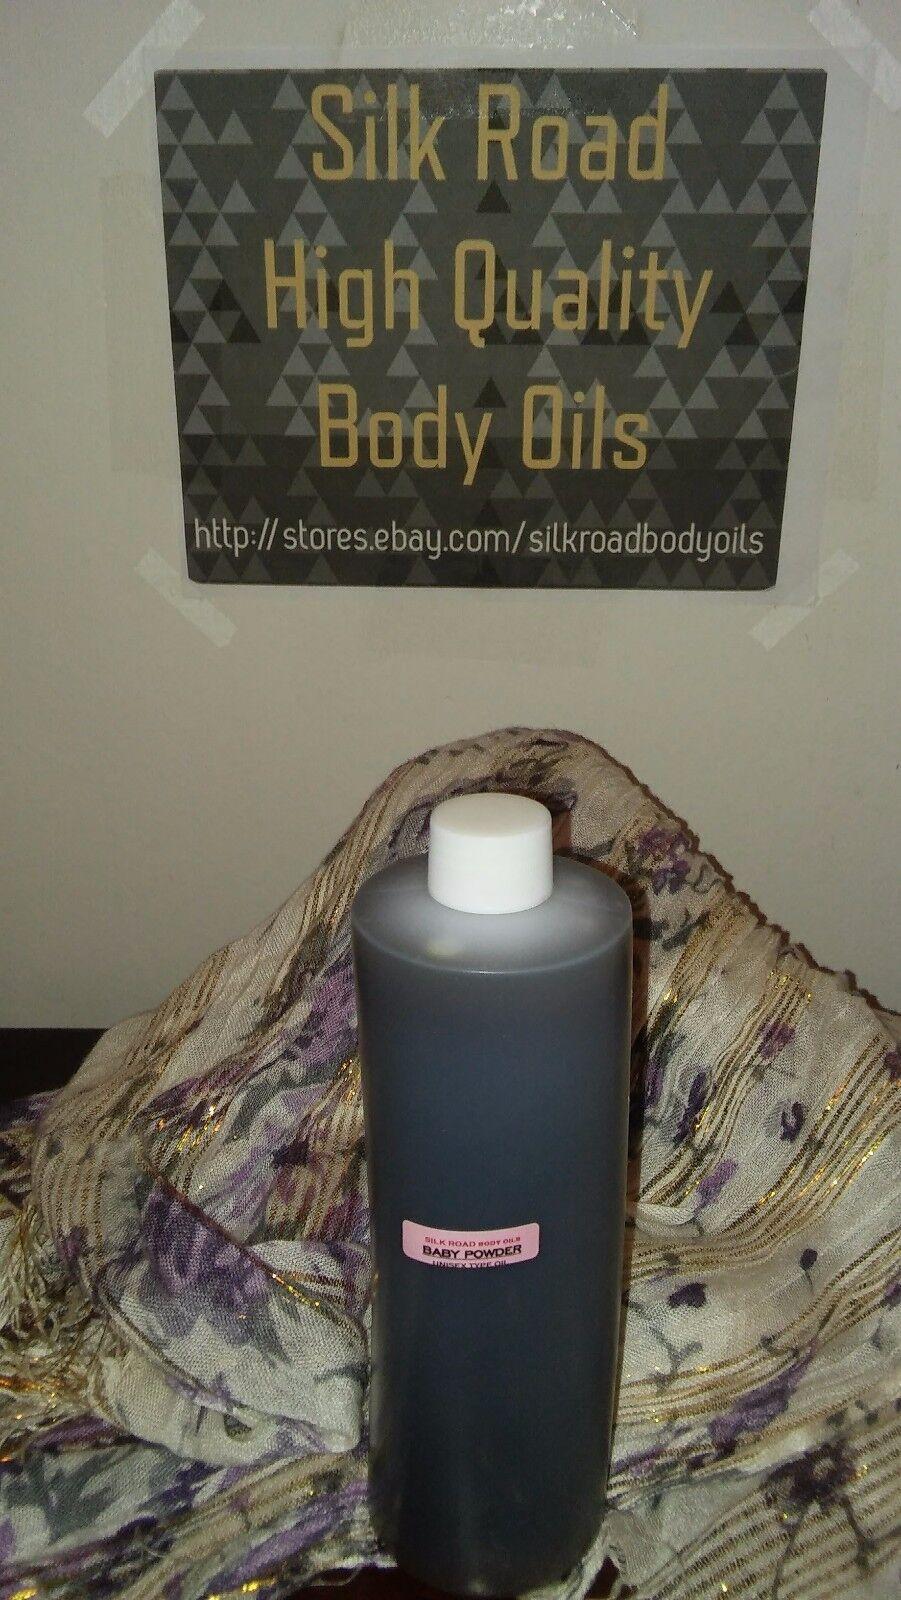 Baby Powder Perfume/Body Oil + Buy 1 Get 1 35% Off